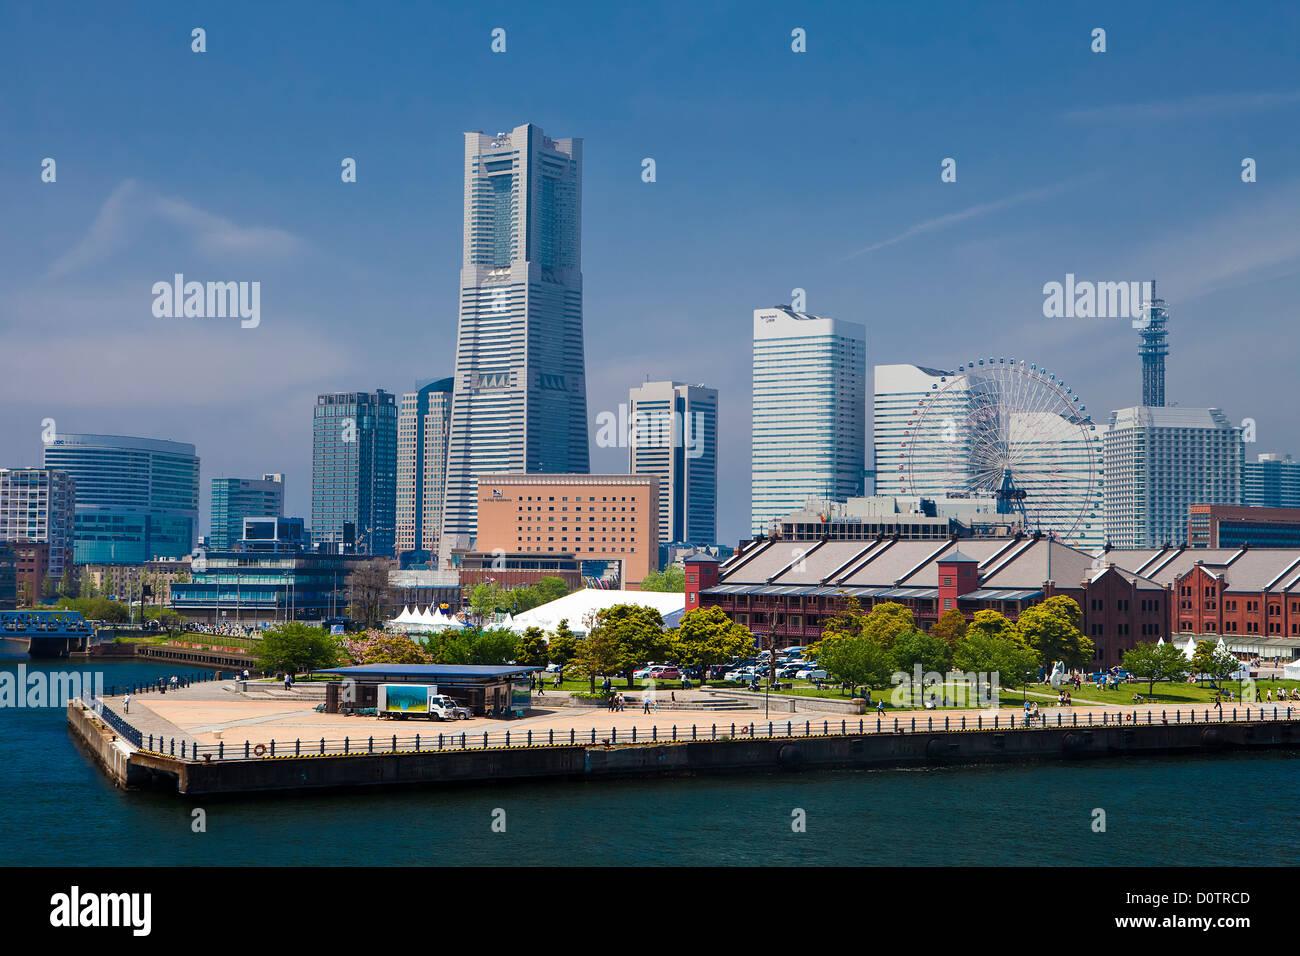 Giappone, Asia, vacanze, viaggi, Yokohama, città di Yokohama skyline, Landmark, edificio, Porto, porto Immagini Stock